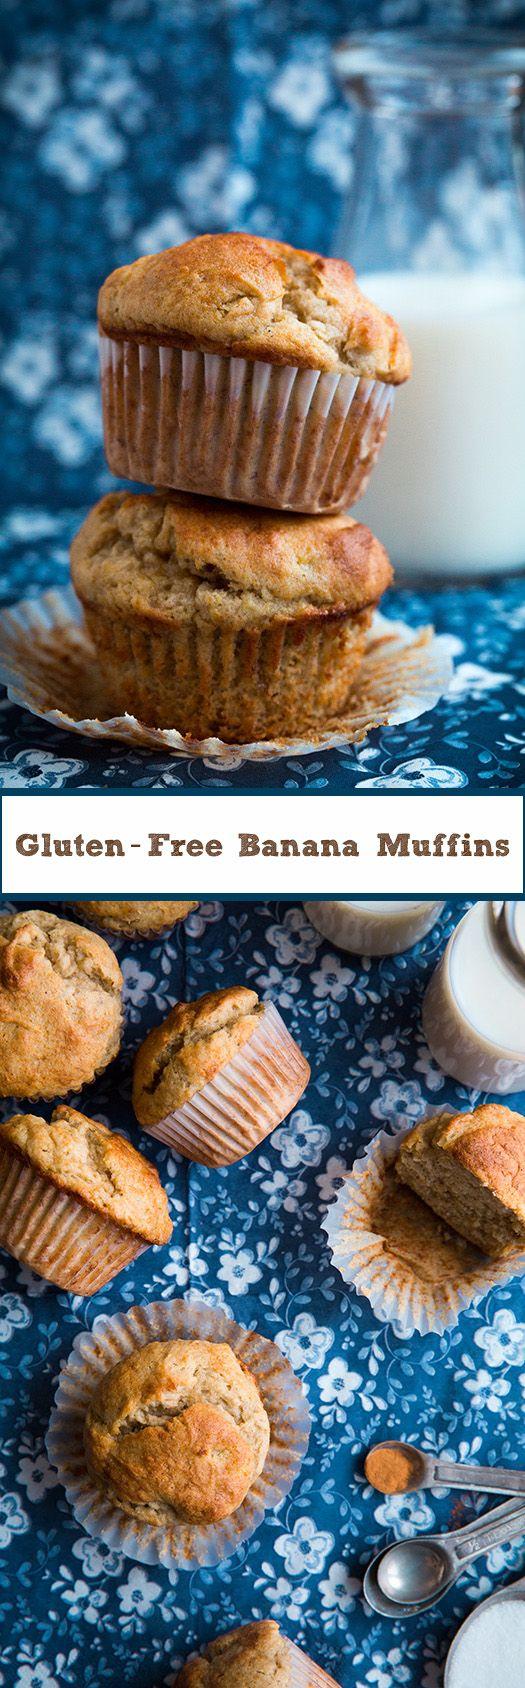 Gluten-Free Banana Muffins - Cooking Classy